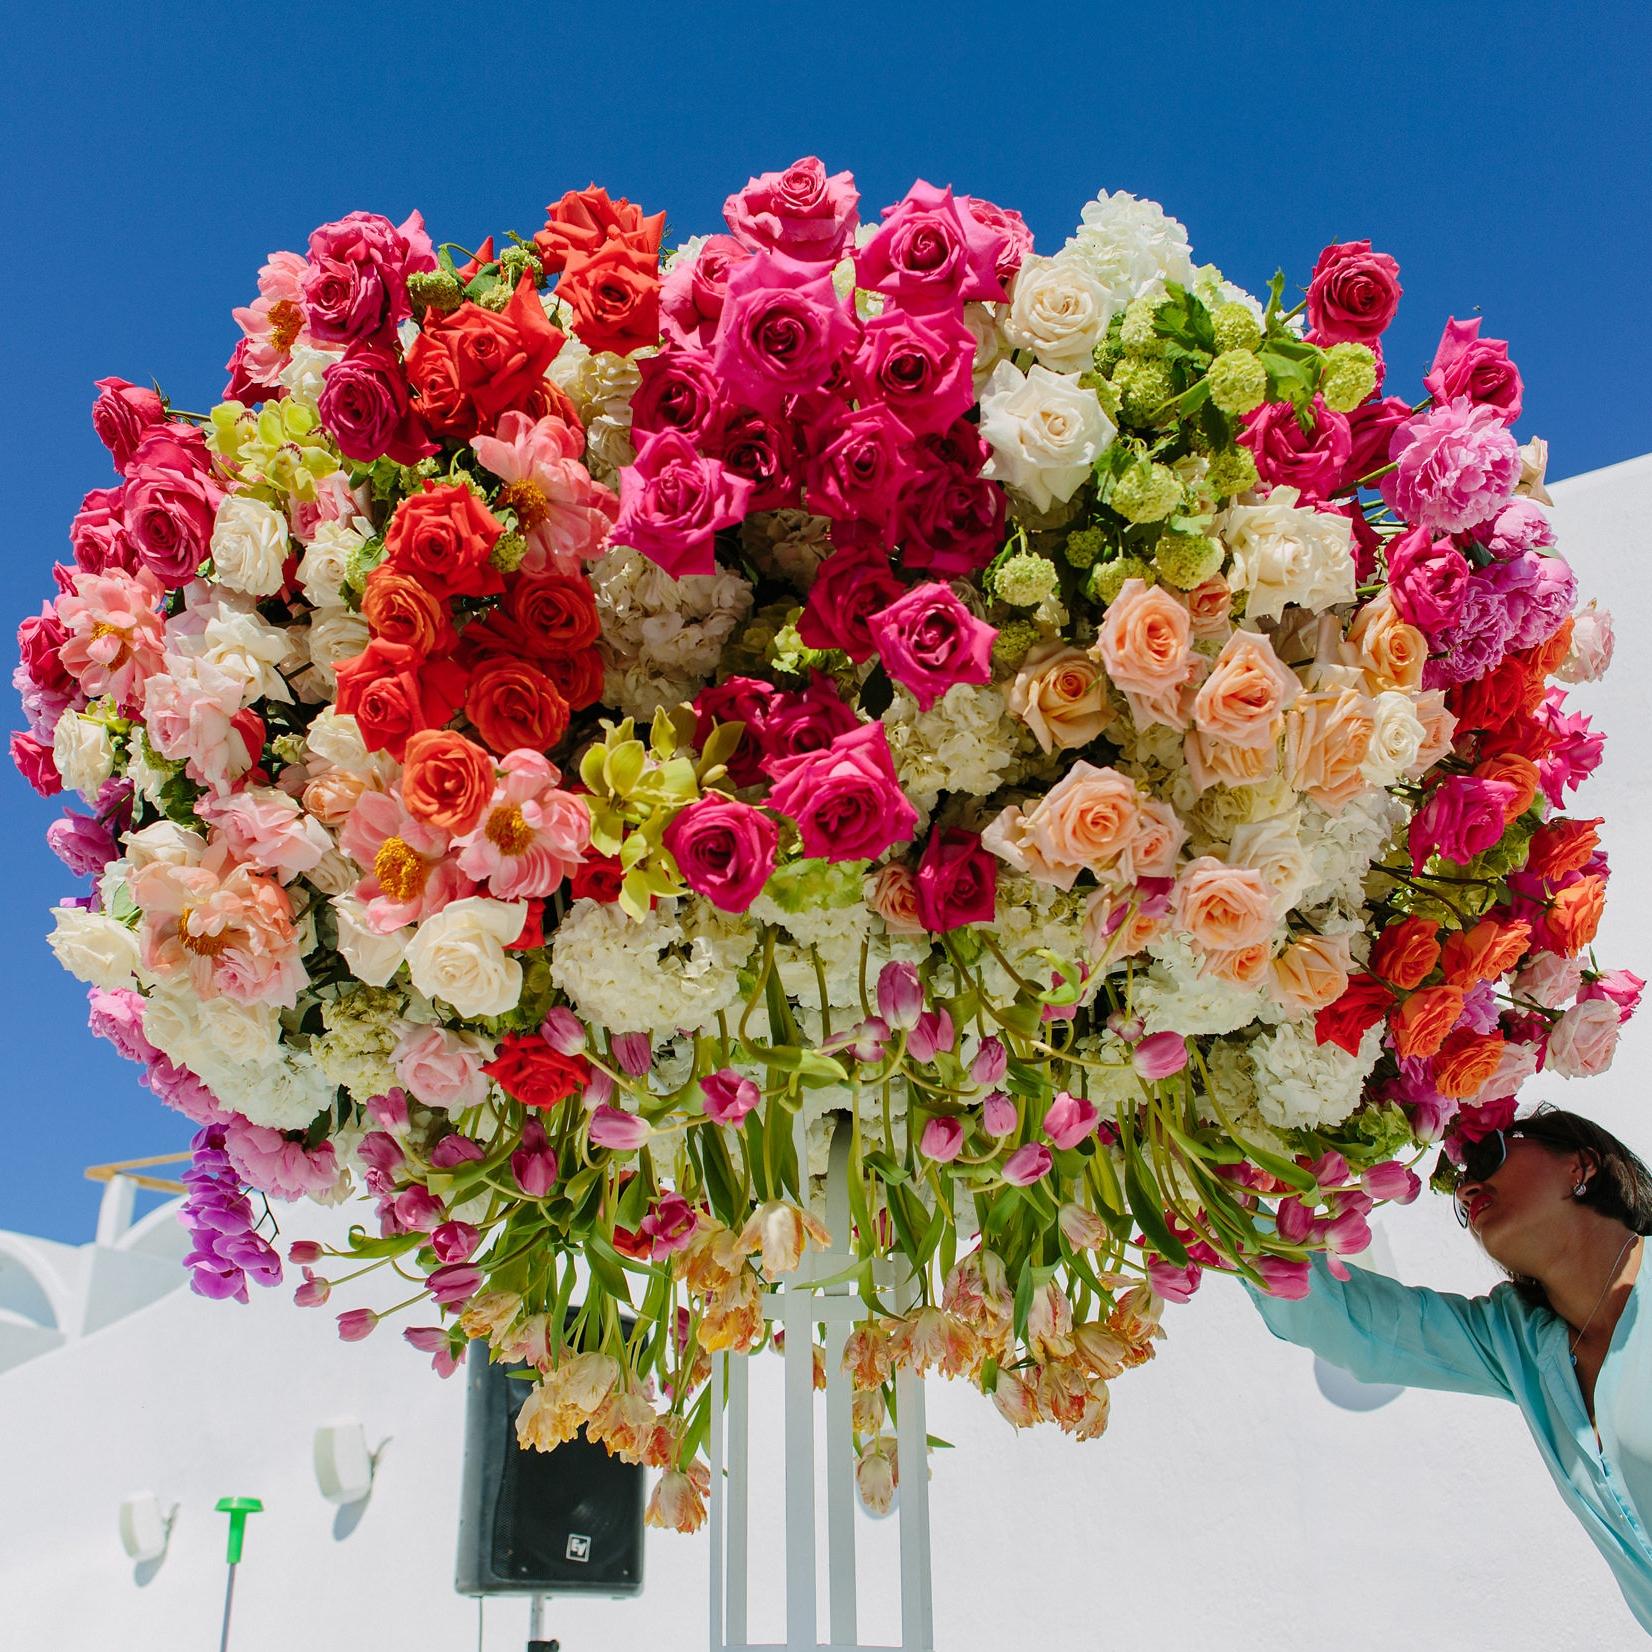 nadia_duran_destination_weddings_floral_desing.JPG